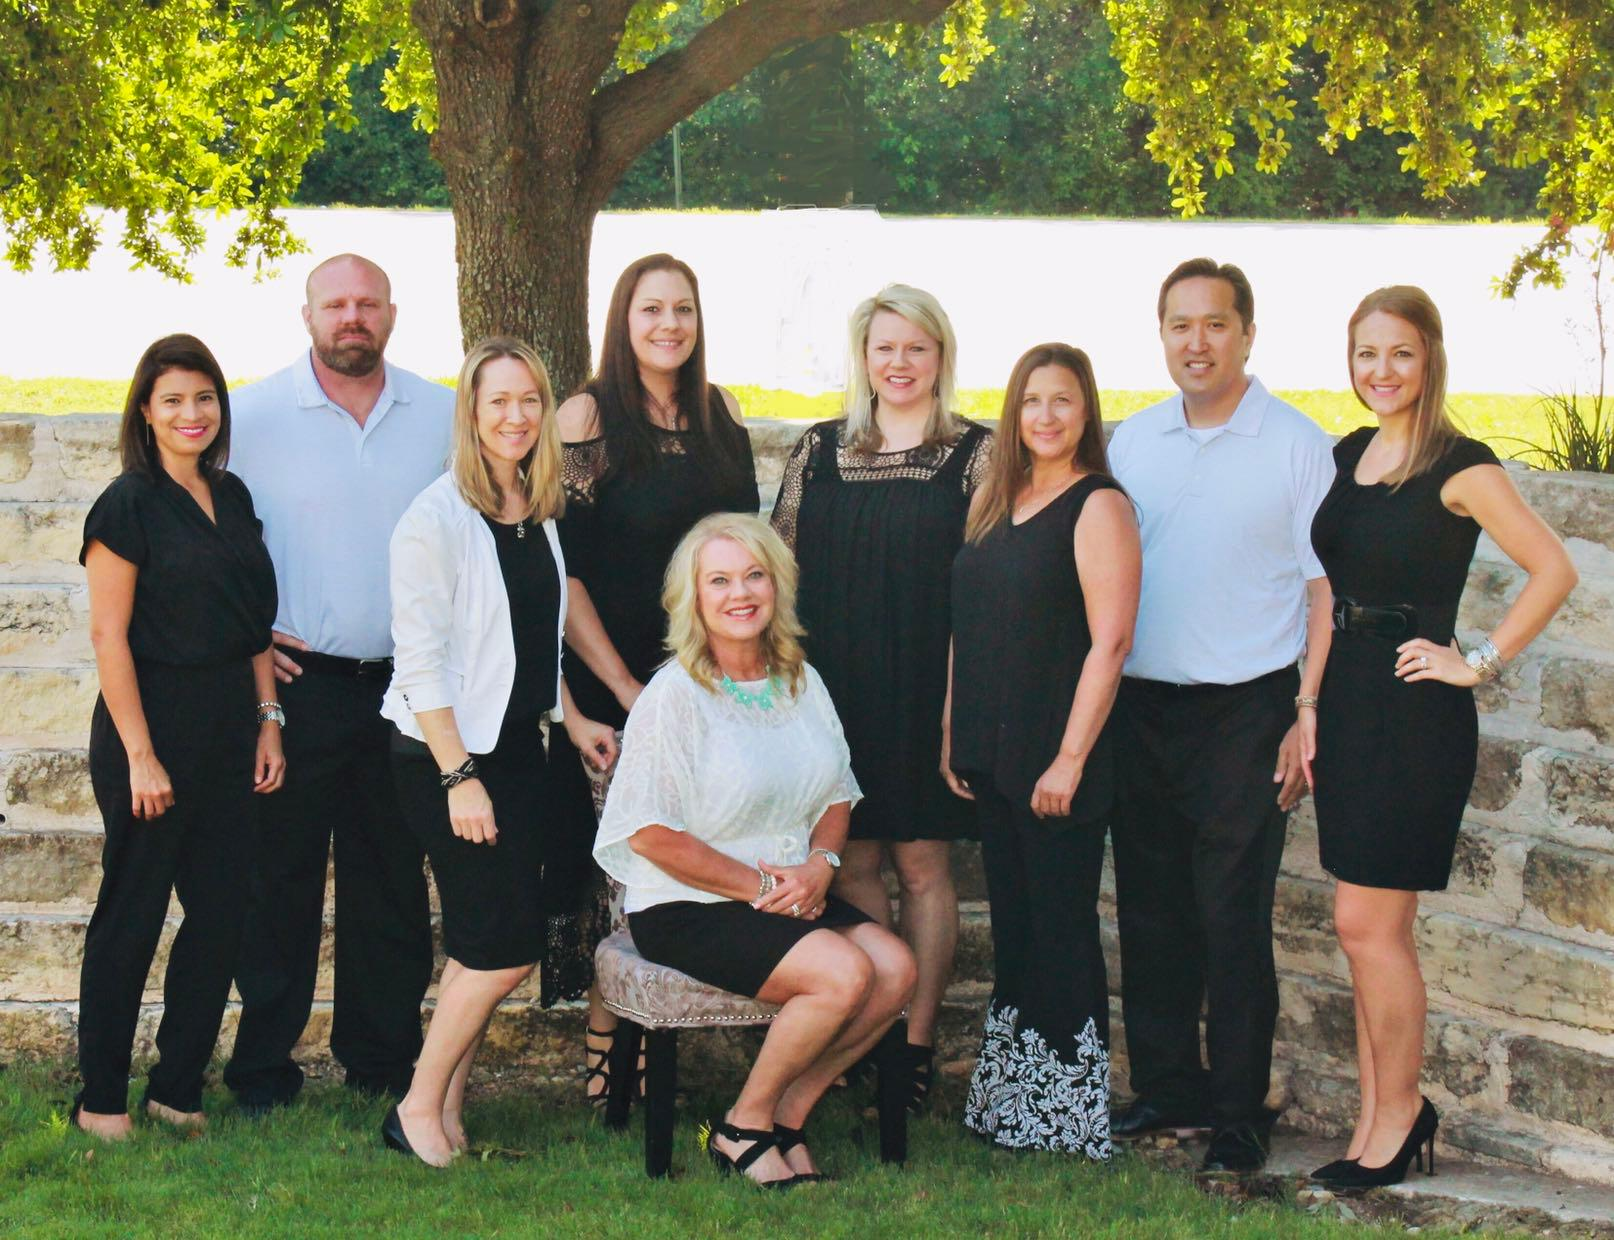 Amy Maddox: Allstate Insurance